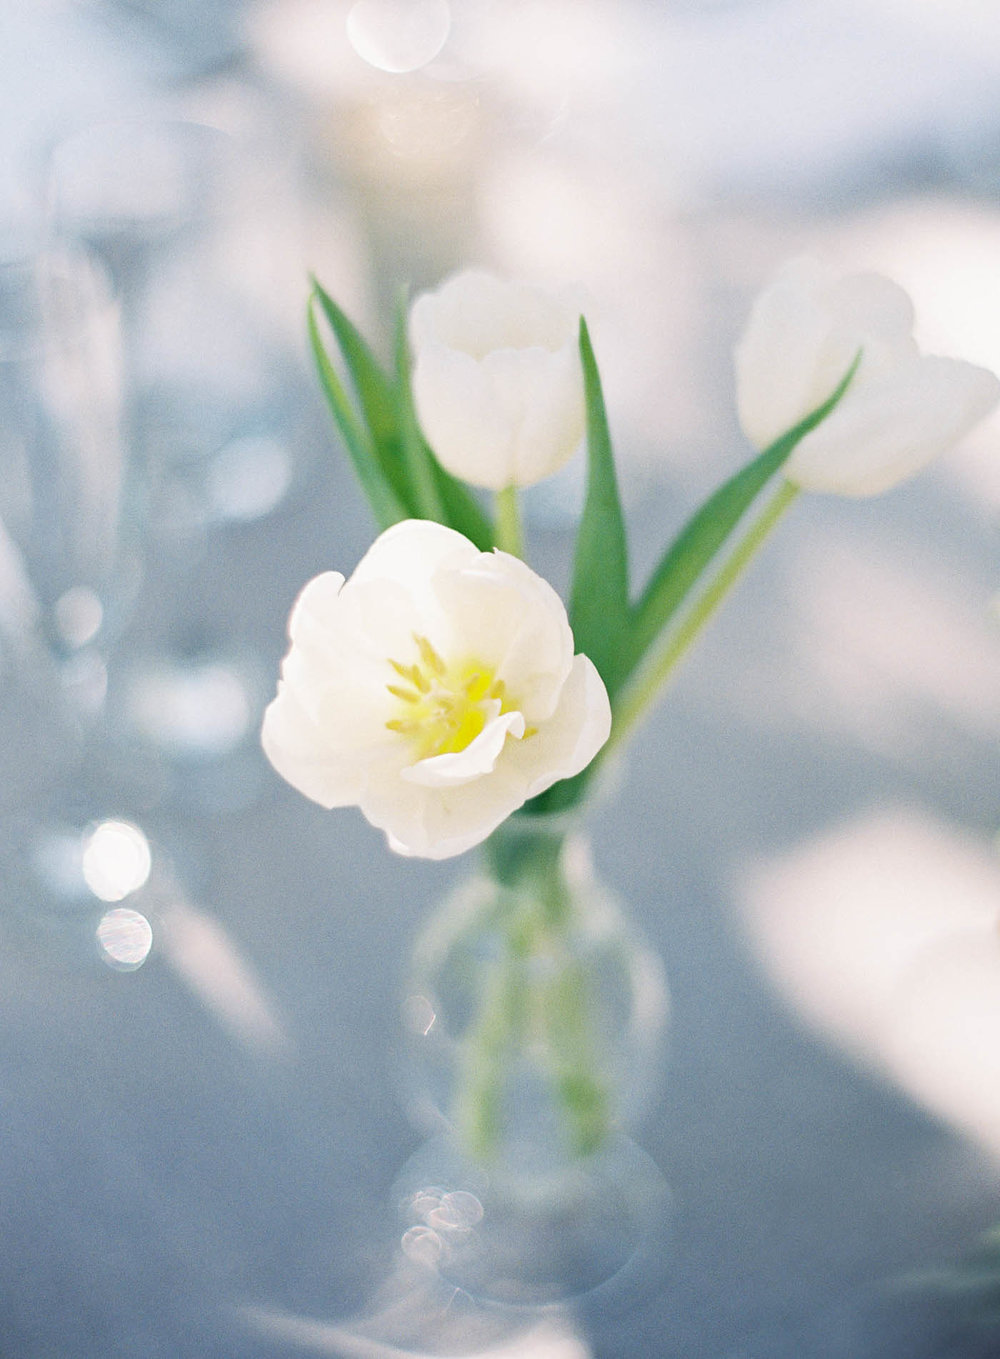 san-juan-capistrano-wedding-jen-huang-20.jpg